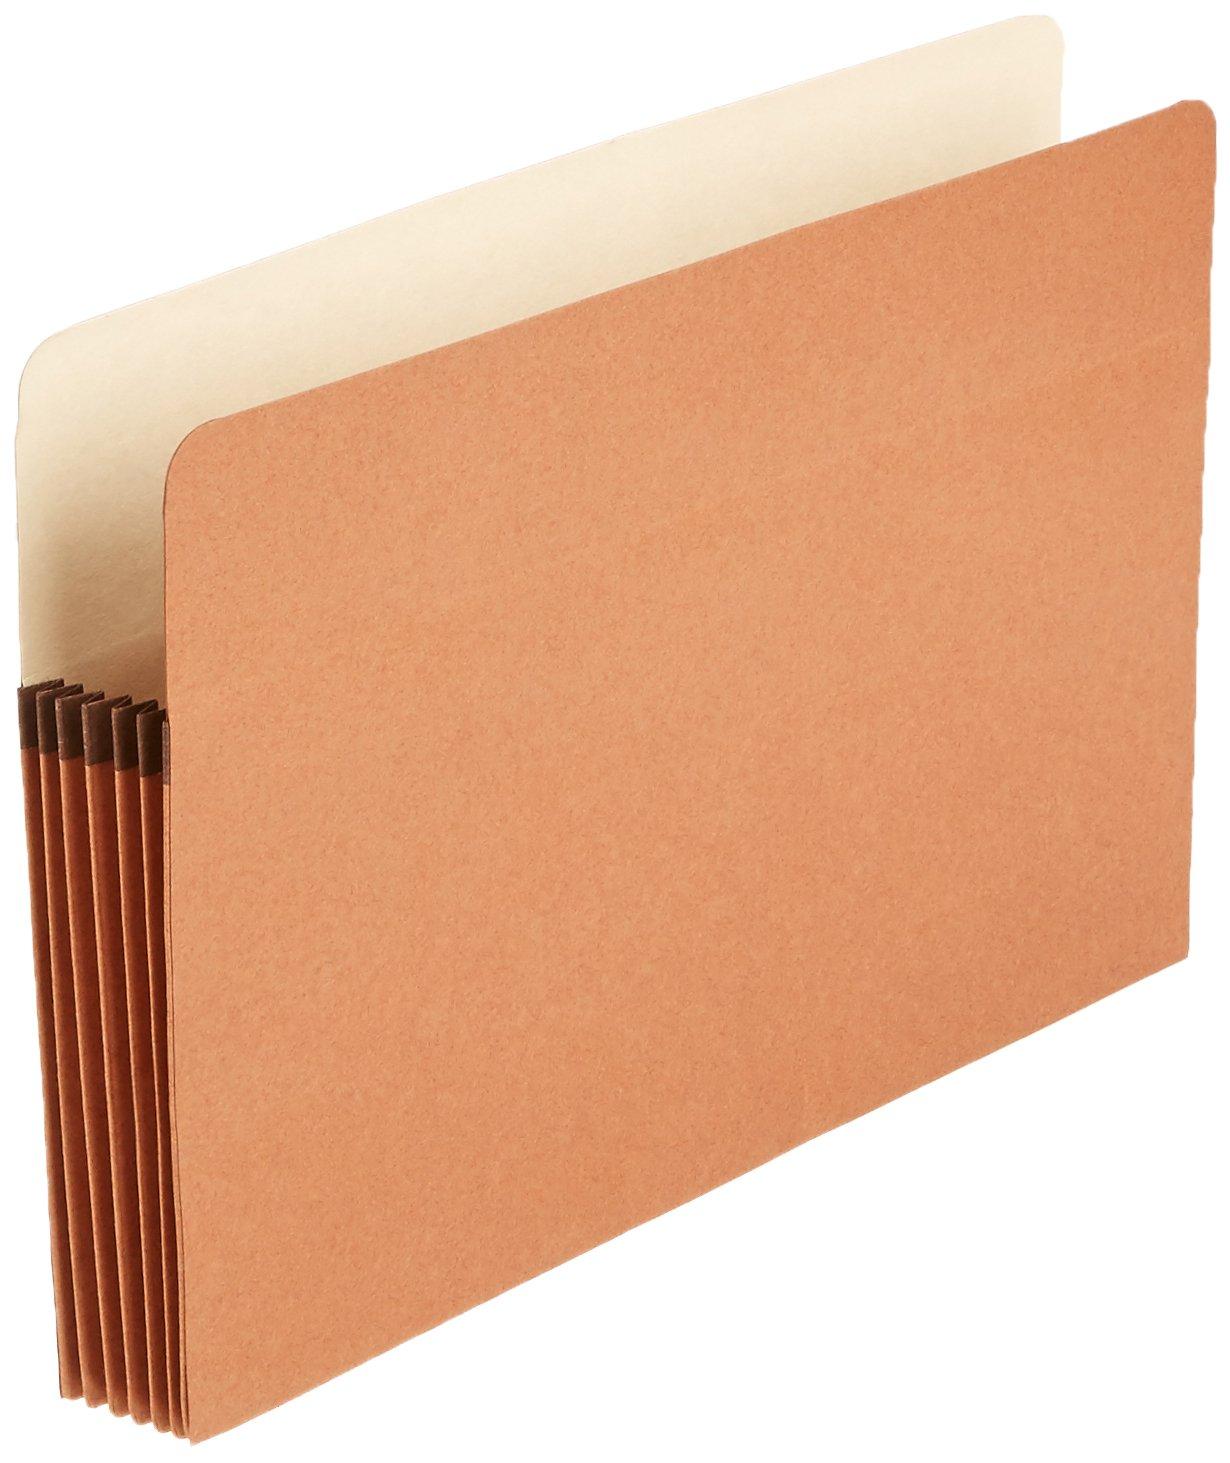 AmazonBasics File Folders Pocket , Straight-Cut Tab, 5 1/4-Inch Expansion, Legal Size, Redrope, 50-Pack - AMZ74234 by AmazonBasics